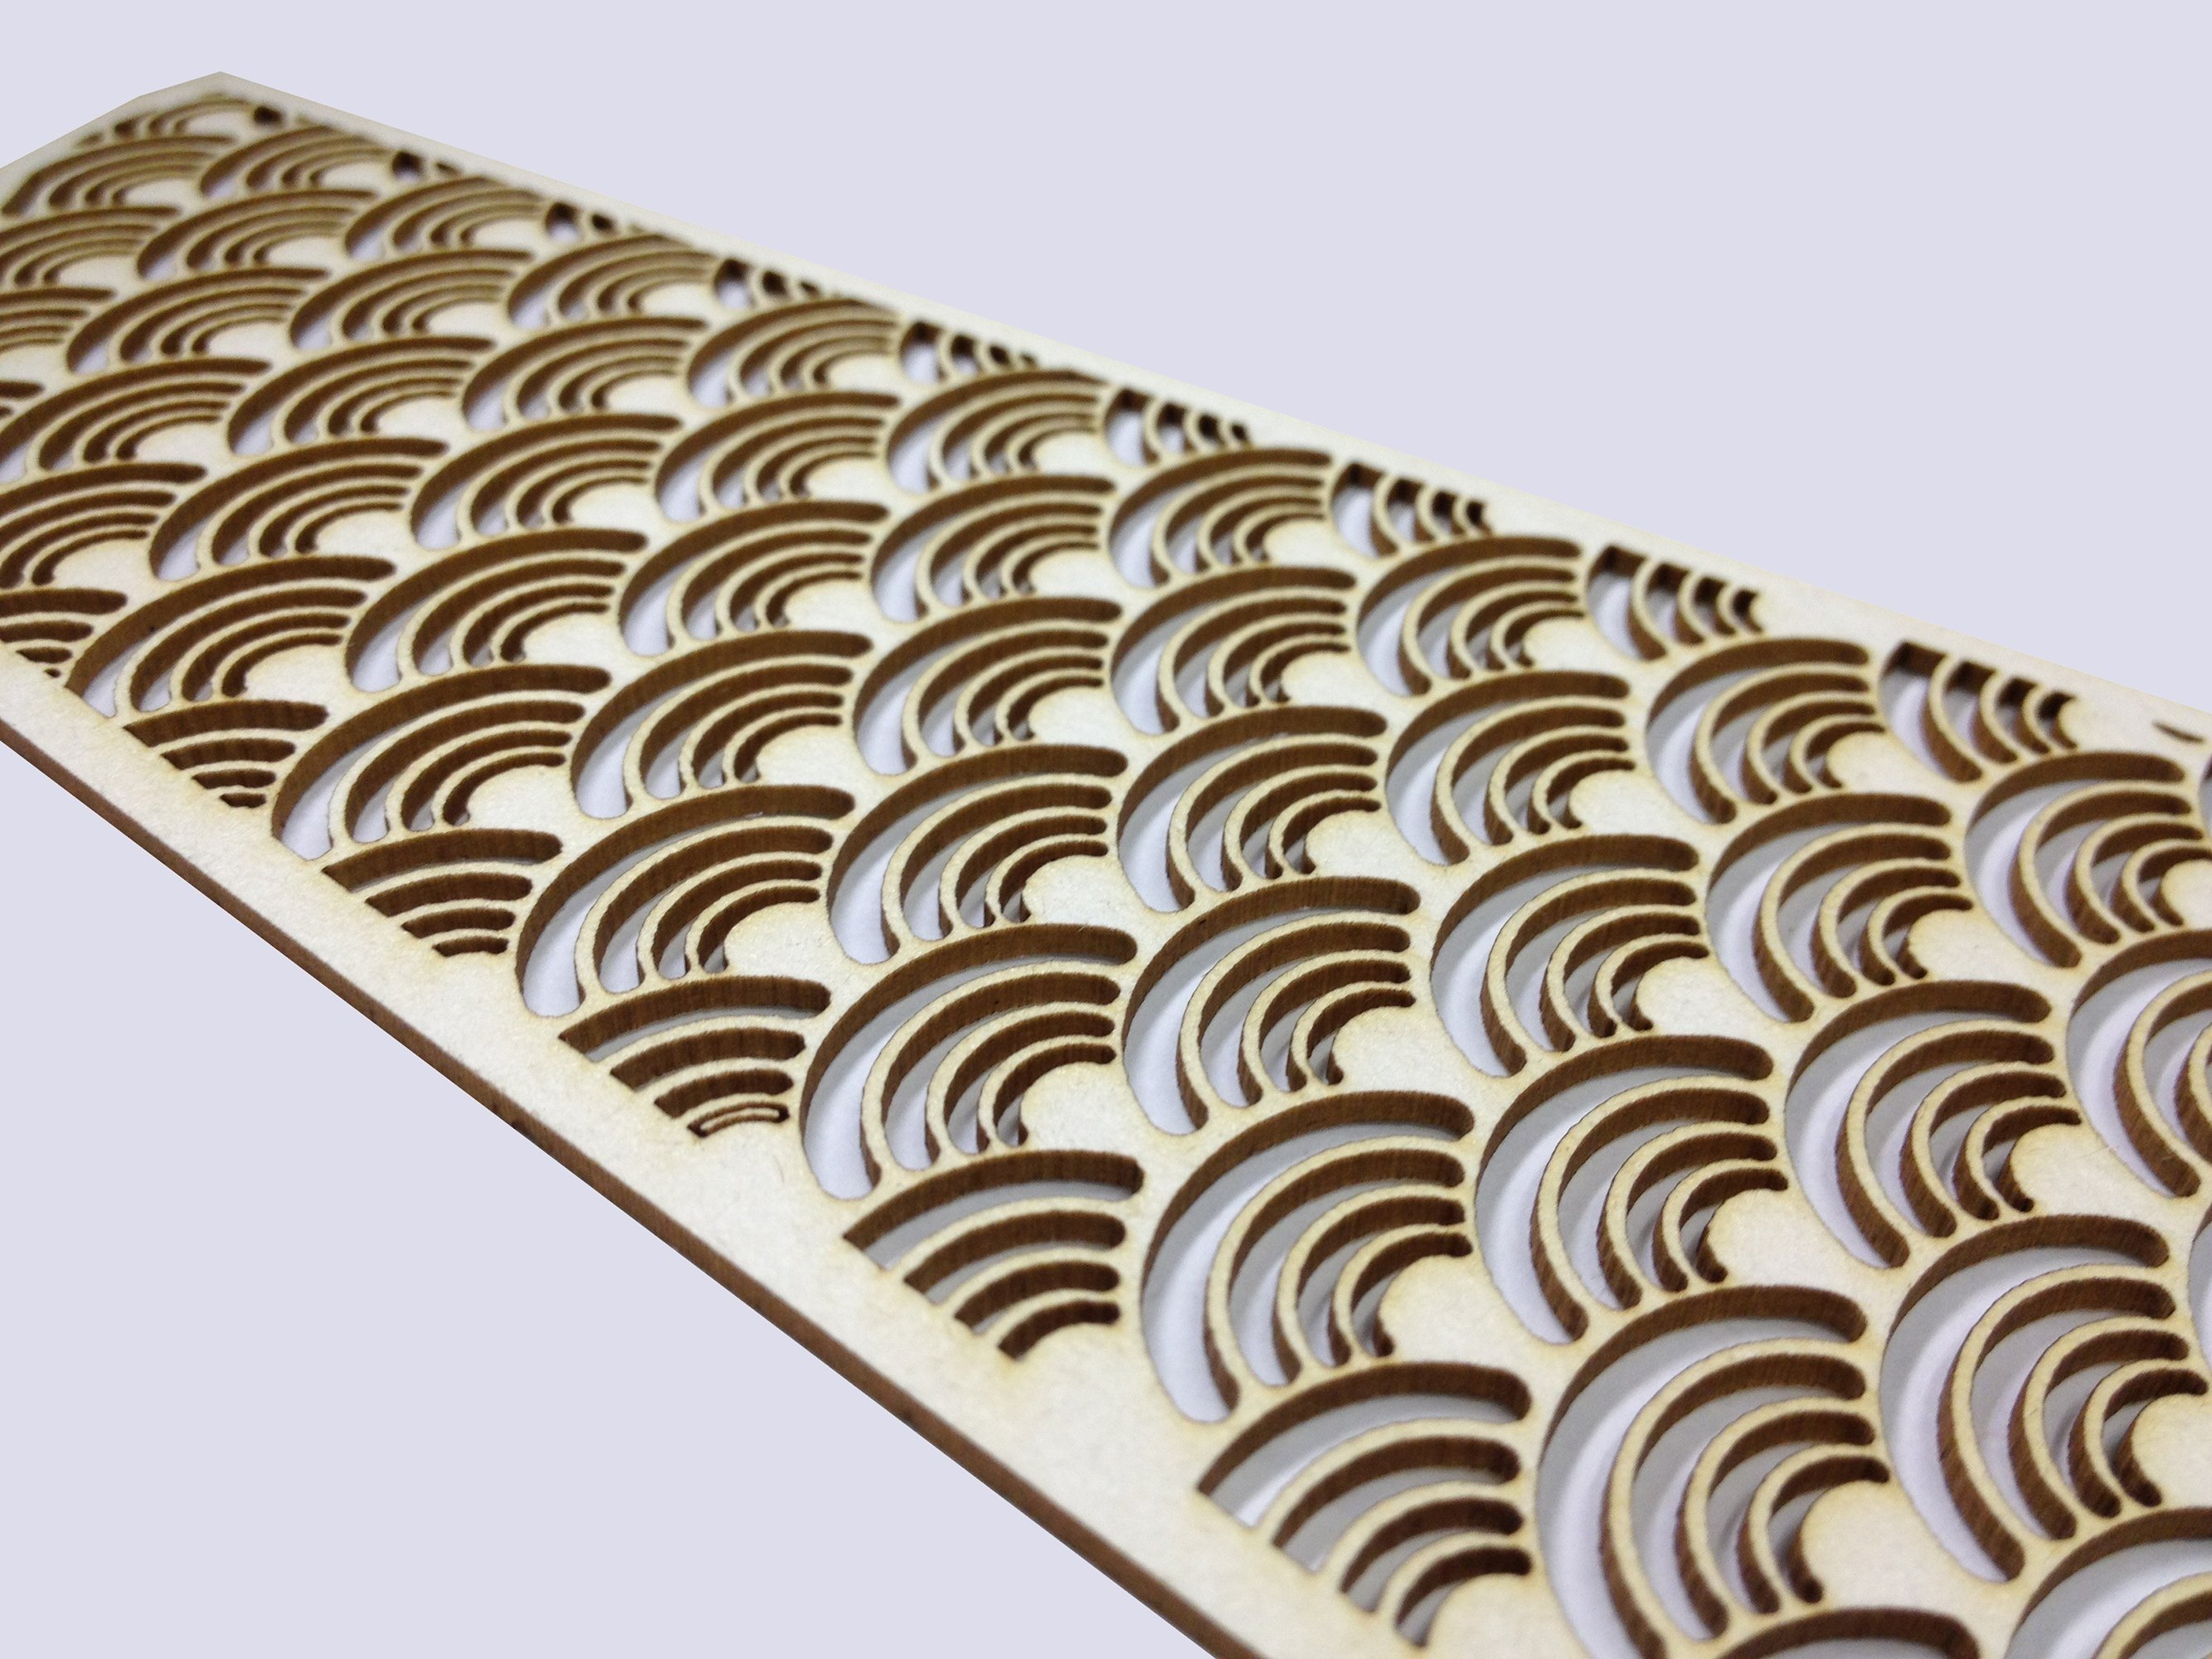 Laser cut cardboard intricate shape